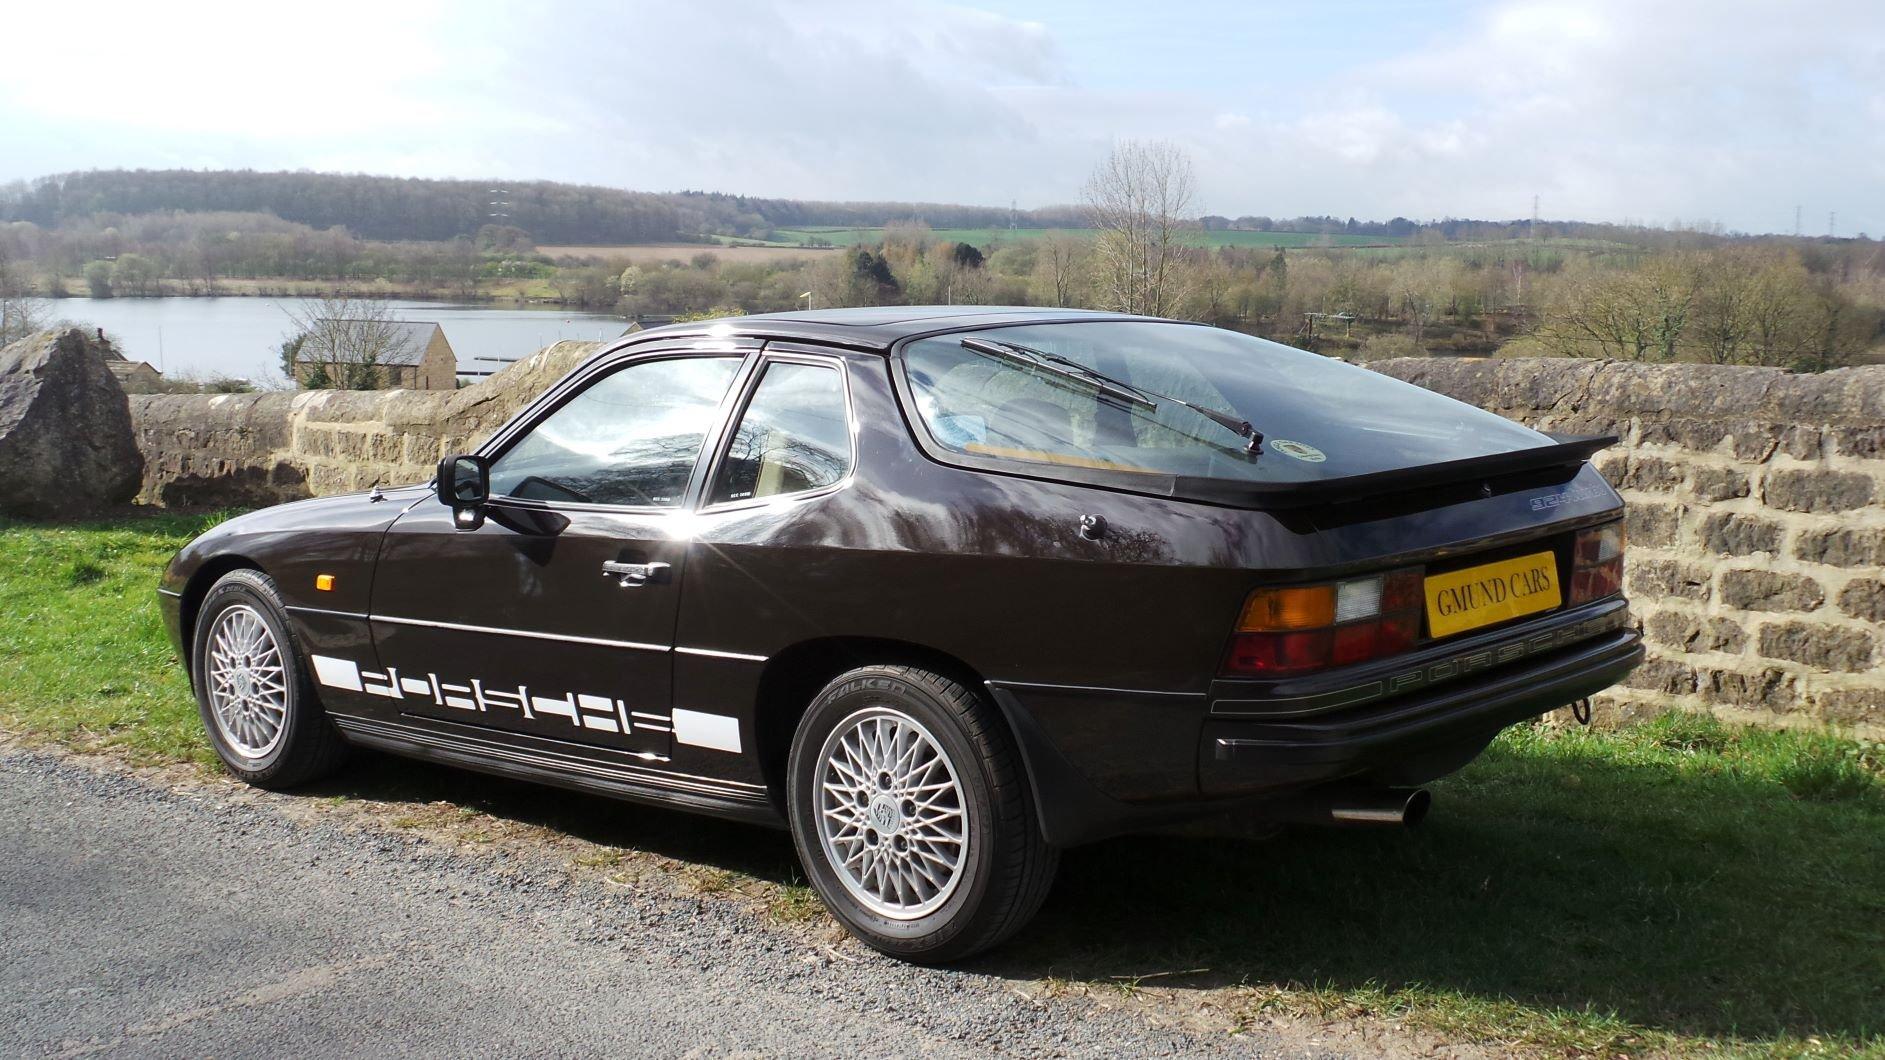 1981 Porsche 924 Turbo series 2 For Sale (picture 3 of 6)